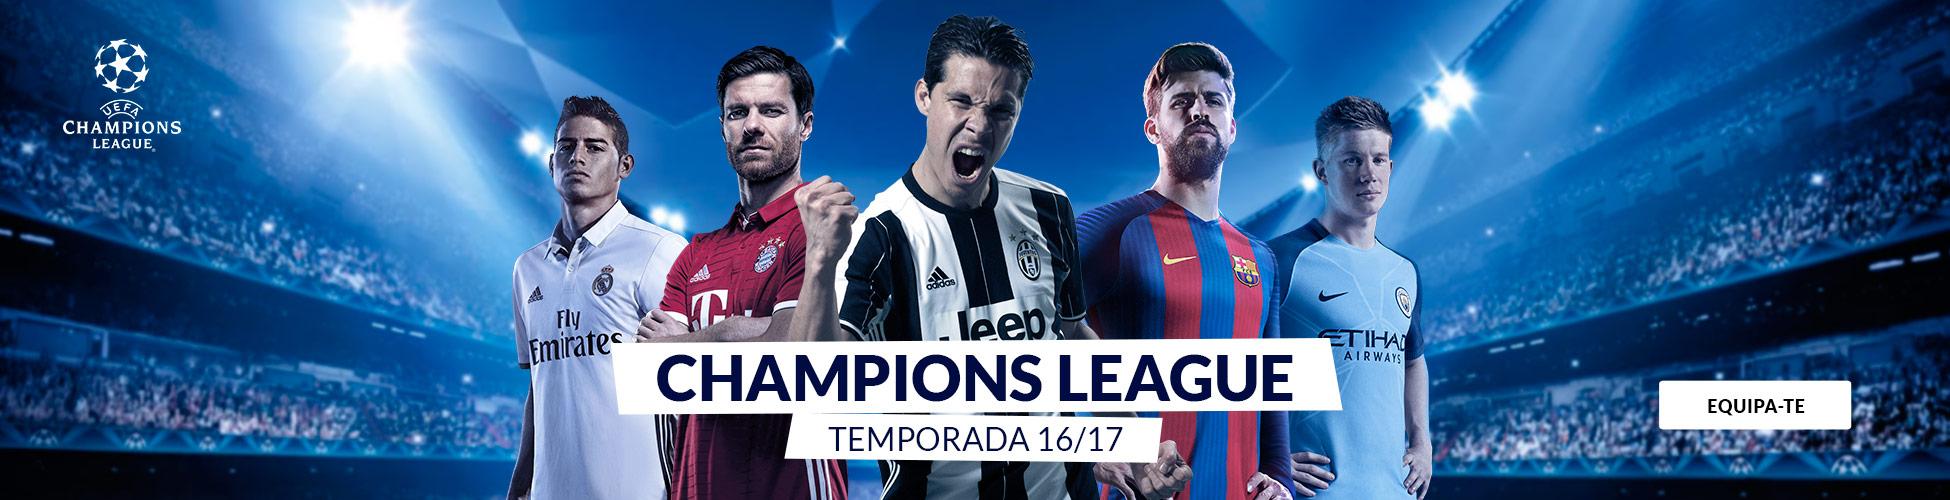 ChampionsLeague Octubre2016 PT